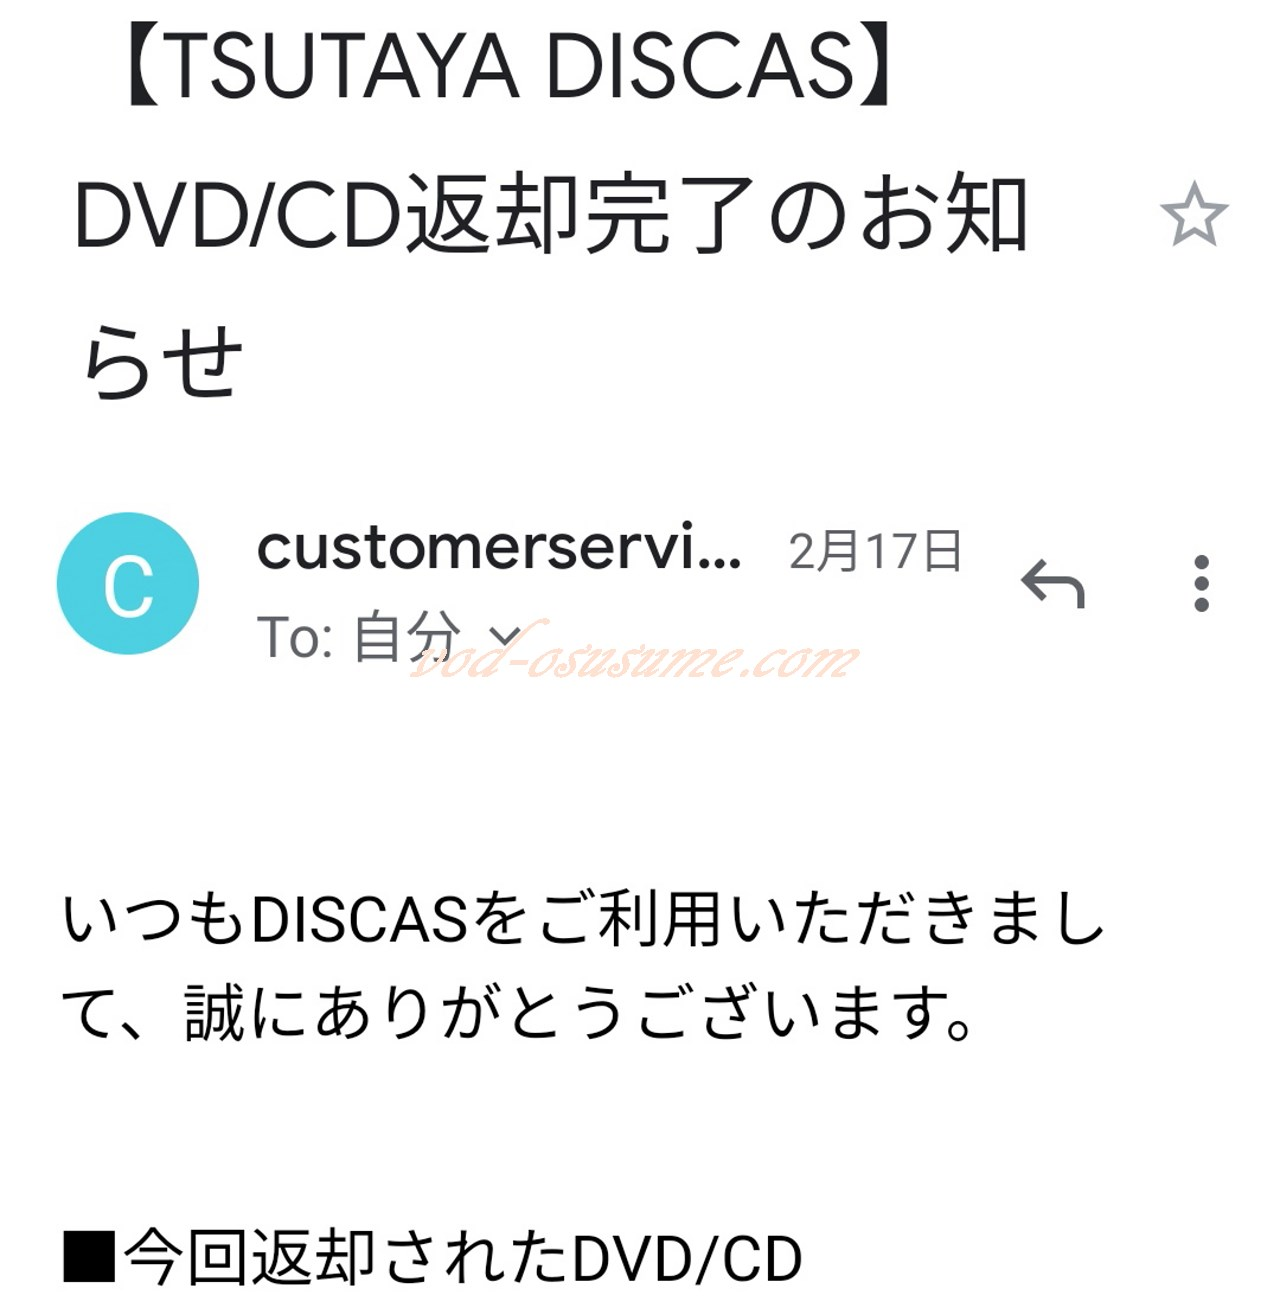 DISCAS返却メール